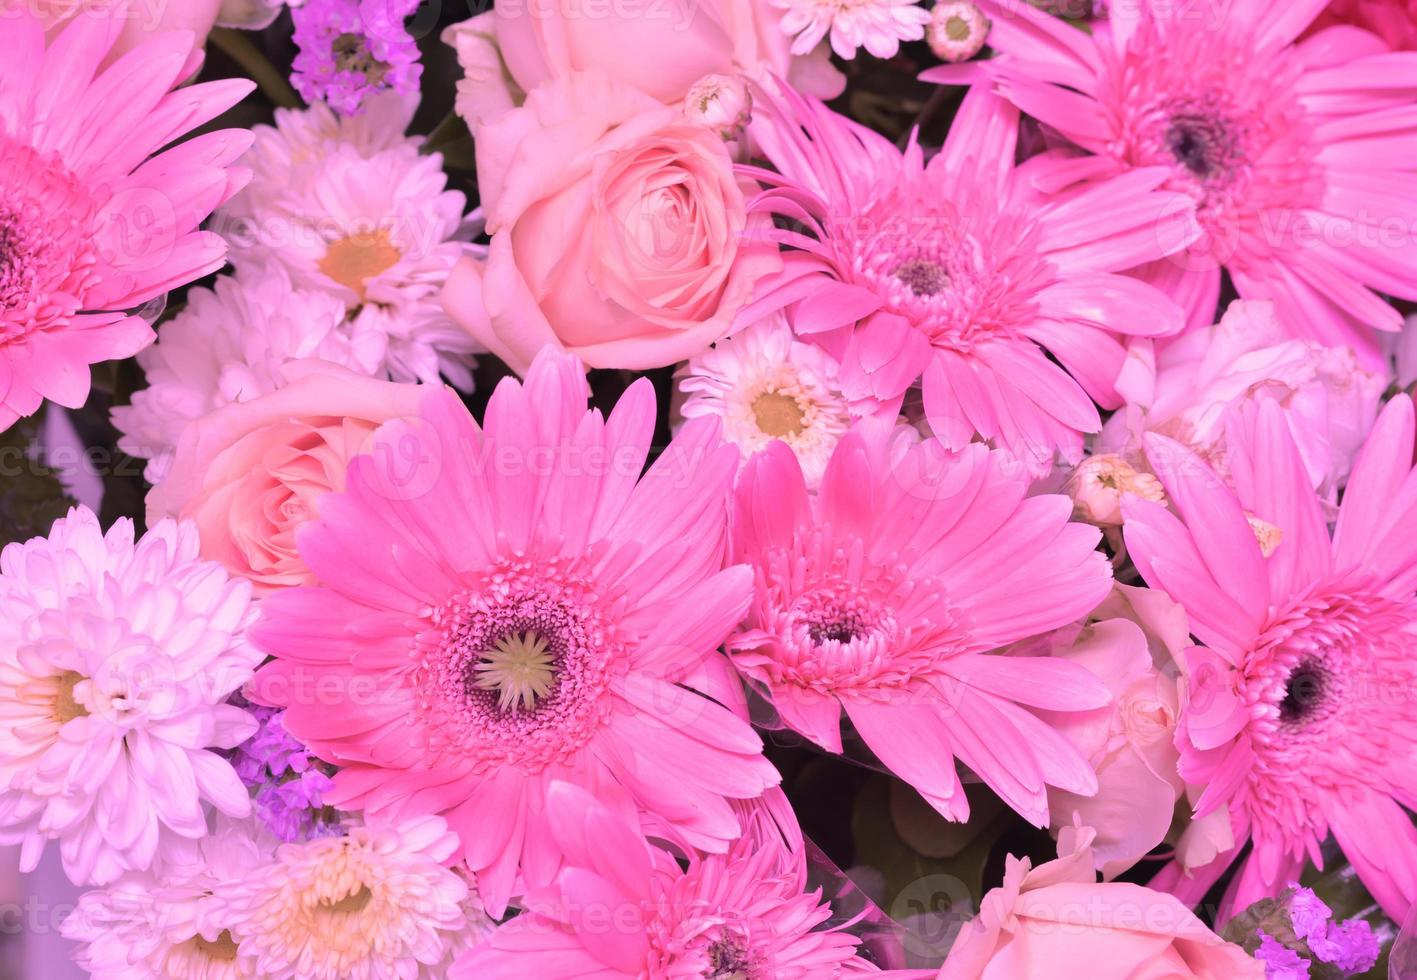 rosa ton av olika blommor, gerbera, lilja, rosor, krysantemum natur bakgrund foto